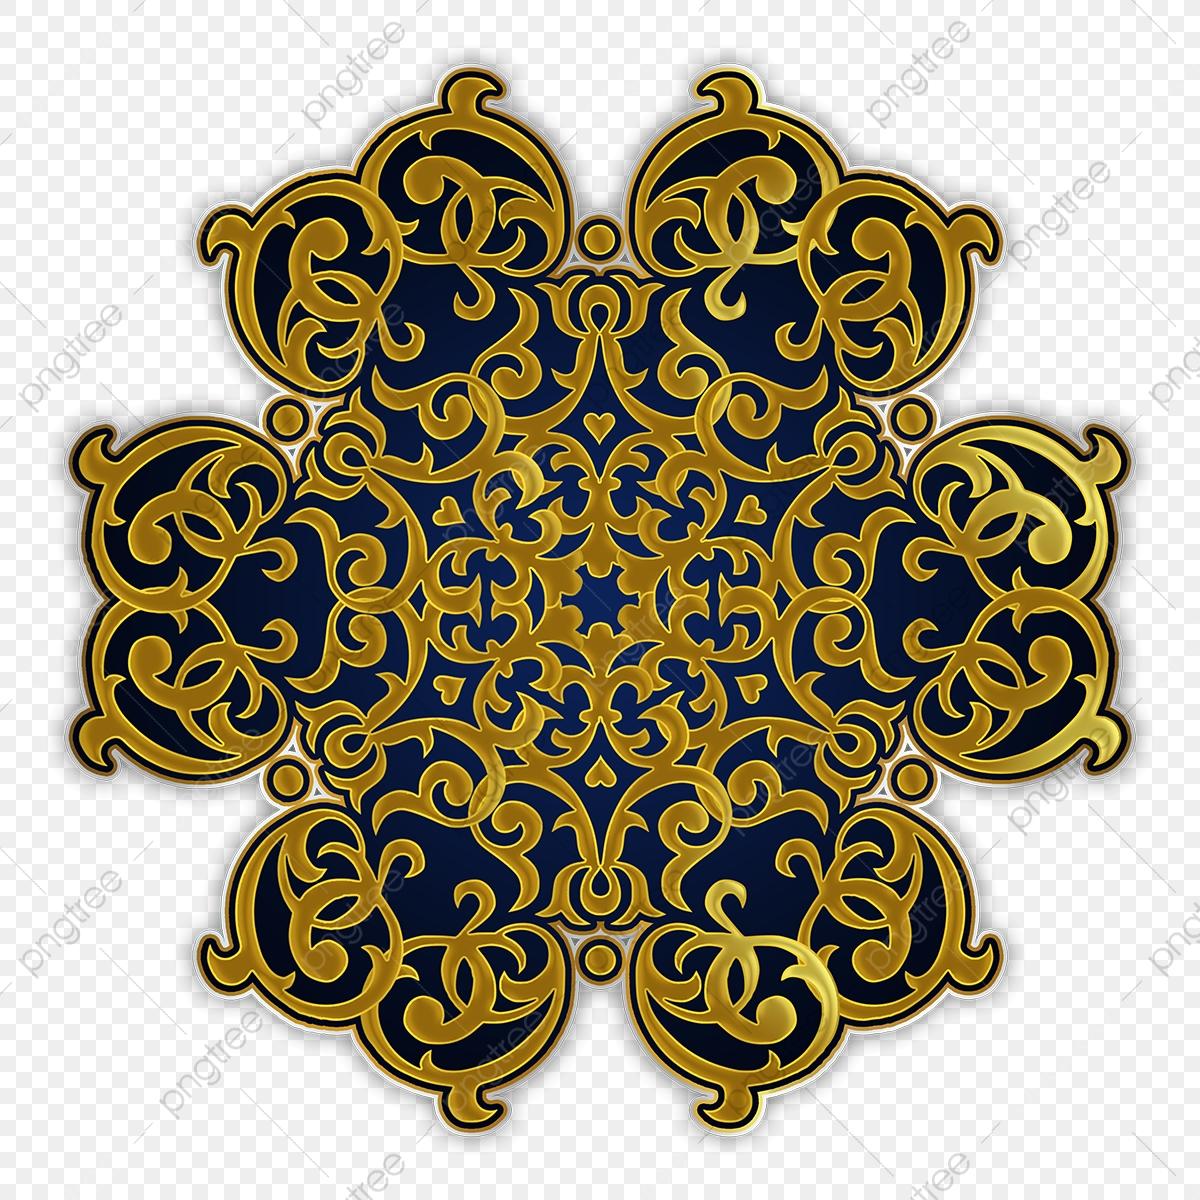 Decorative Golden Islamic Ornament, Islamic, Islamic Decorations.